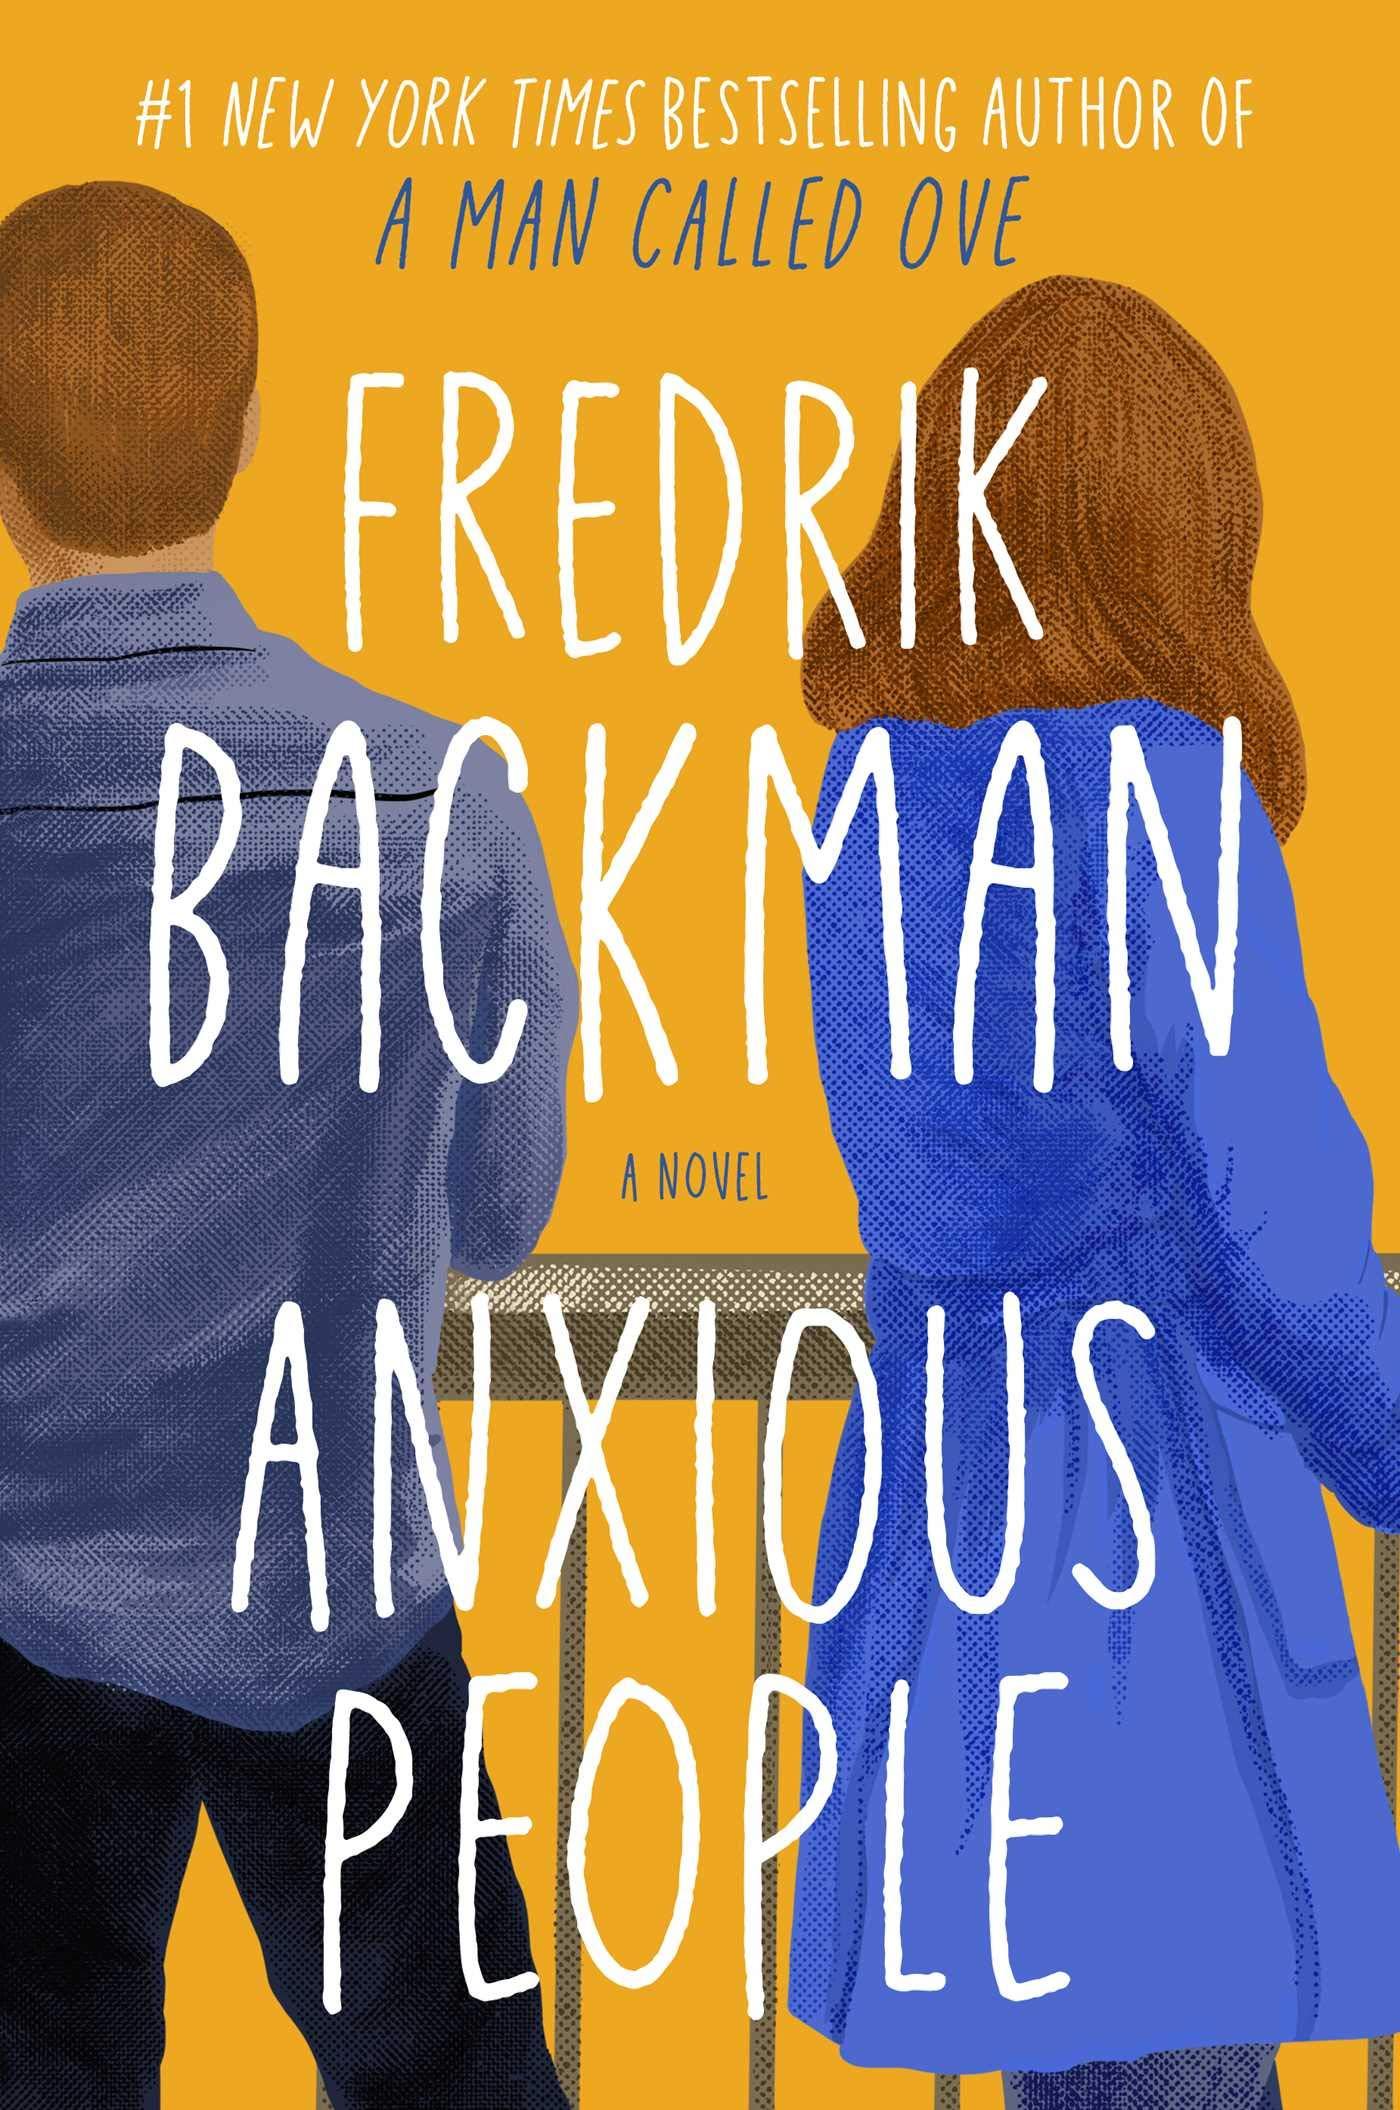 Amazon.com: Anxious People: A Novel (9781501160837): Backman, Fredrik: Books